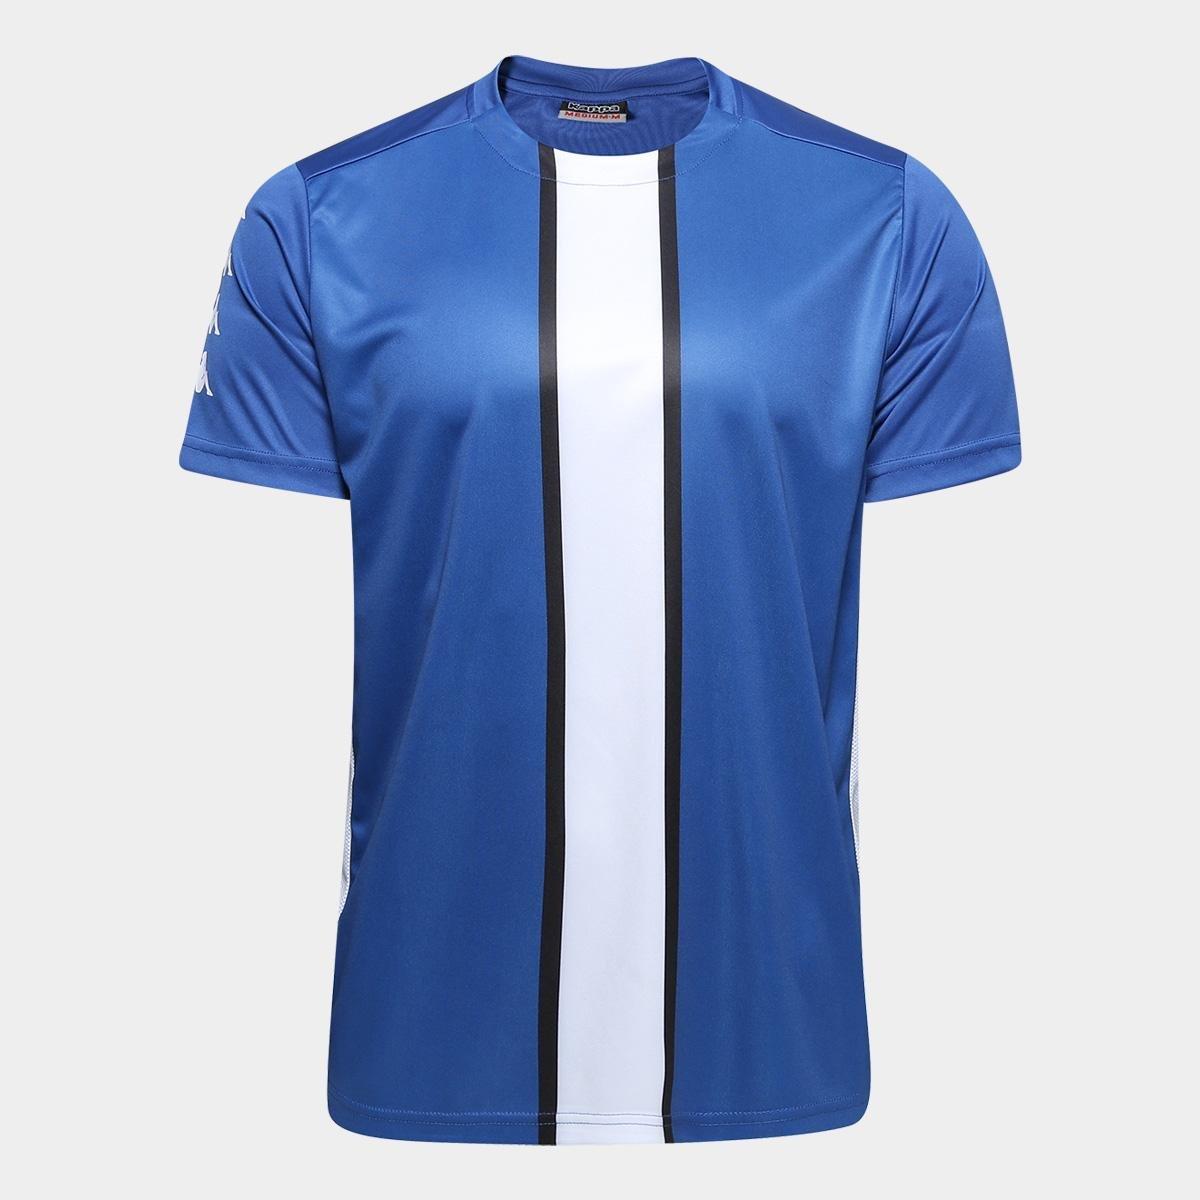 Camisa Kappa 17 Masculina - Azul - Compre Agora  353fc487065b3